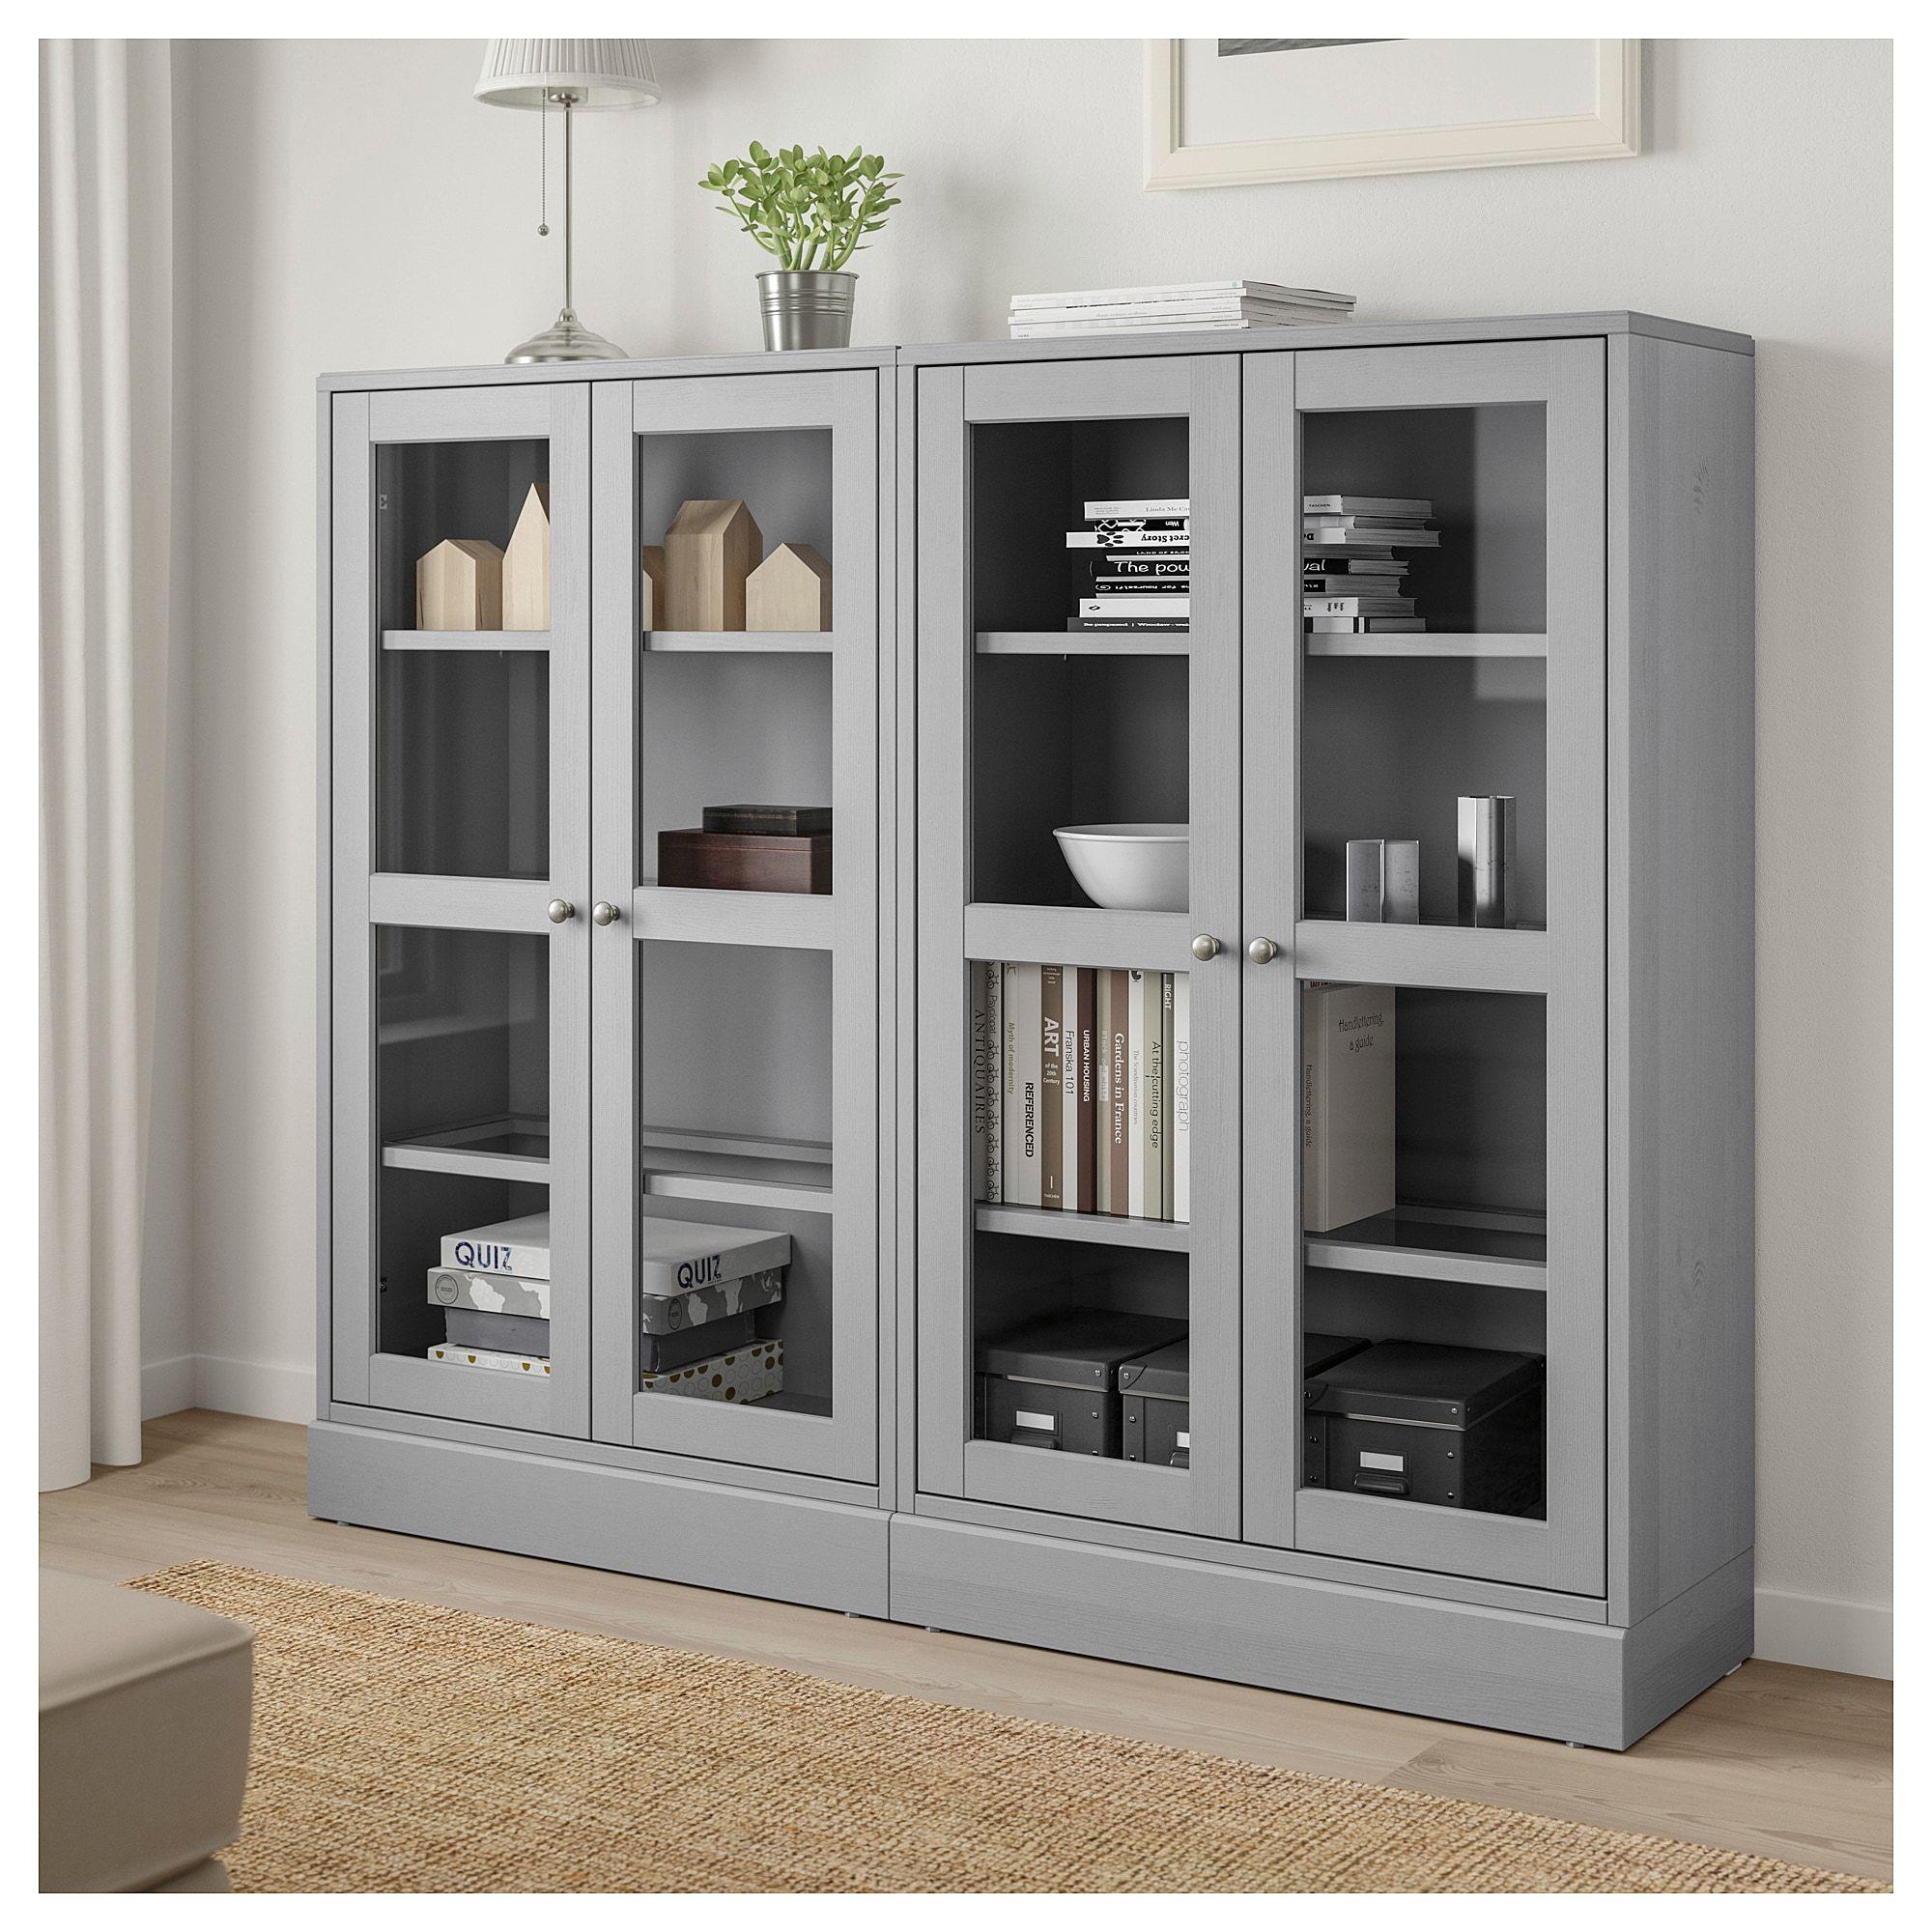 Havsta Storage Combination W Glass Doors Gray 162x37x134 Cm